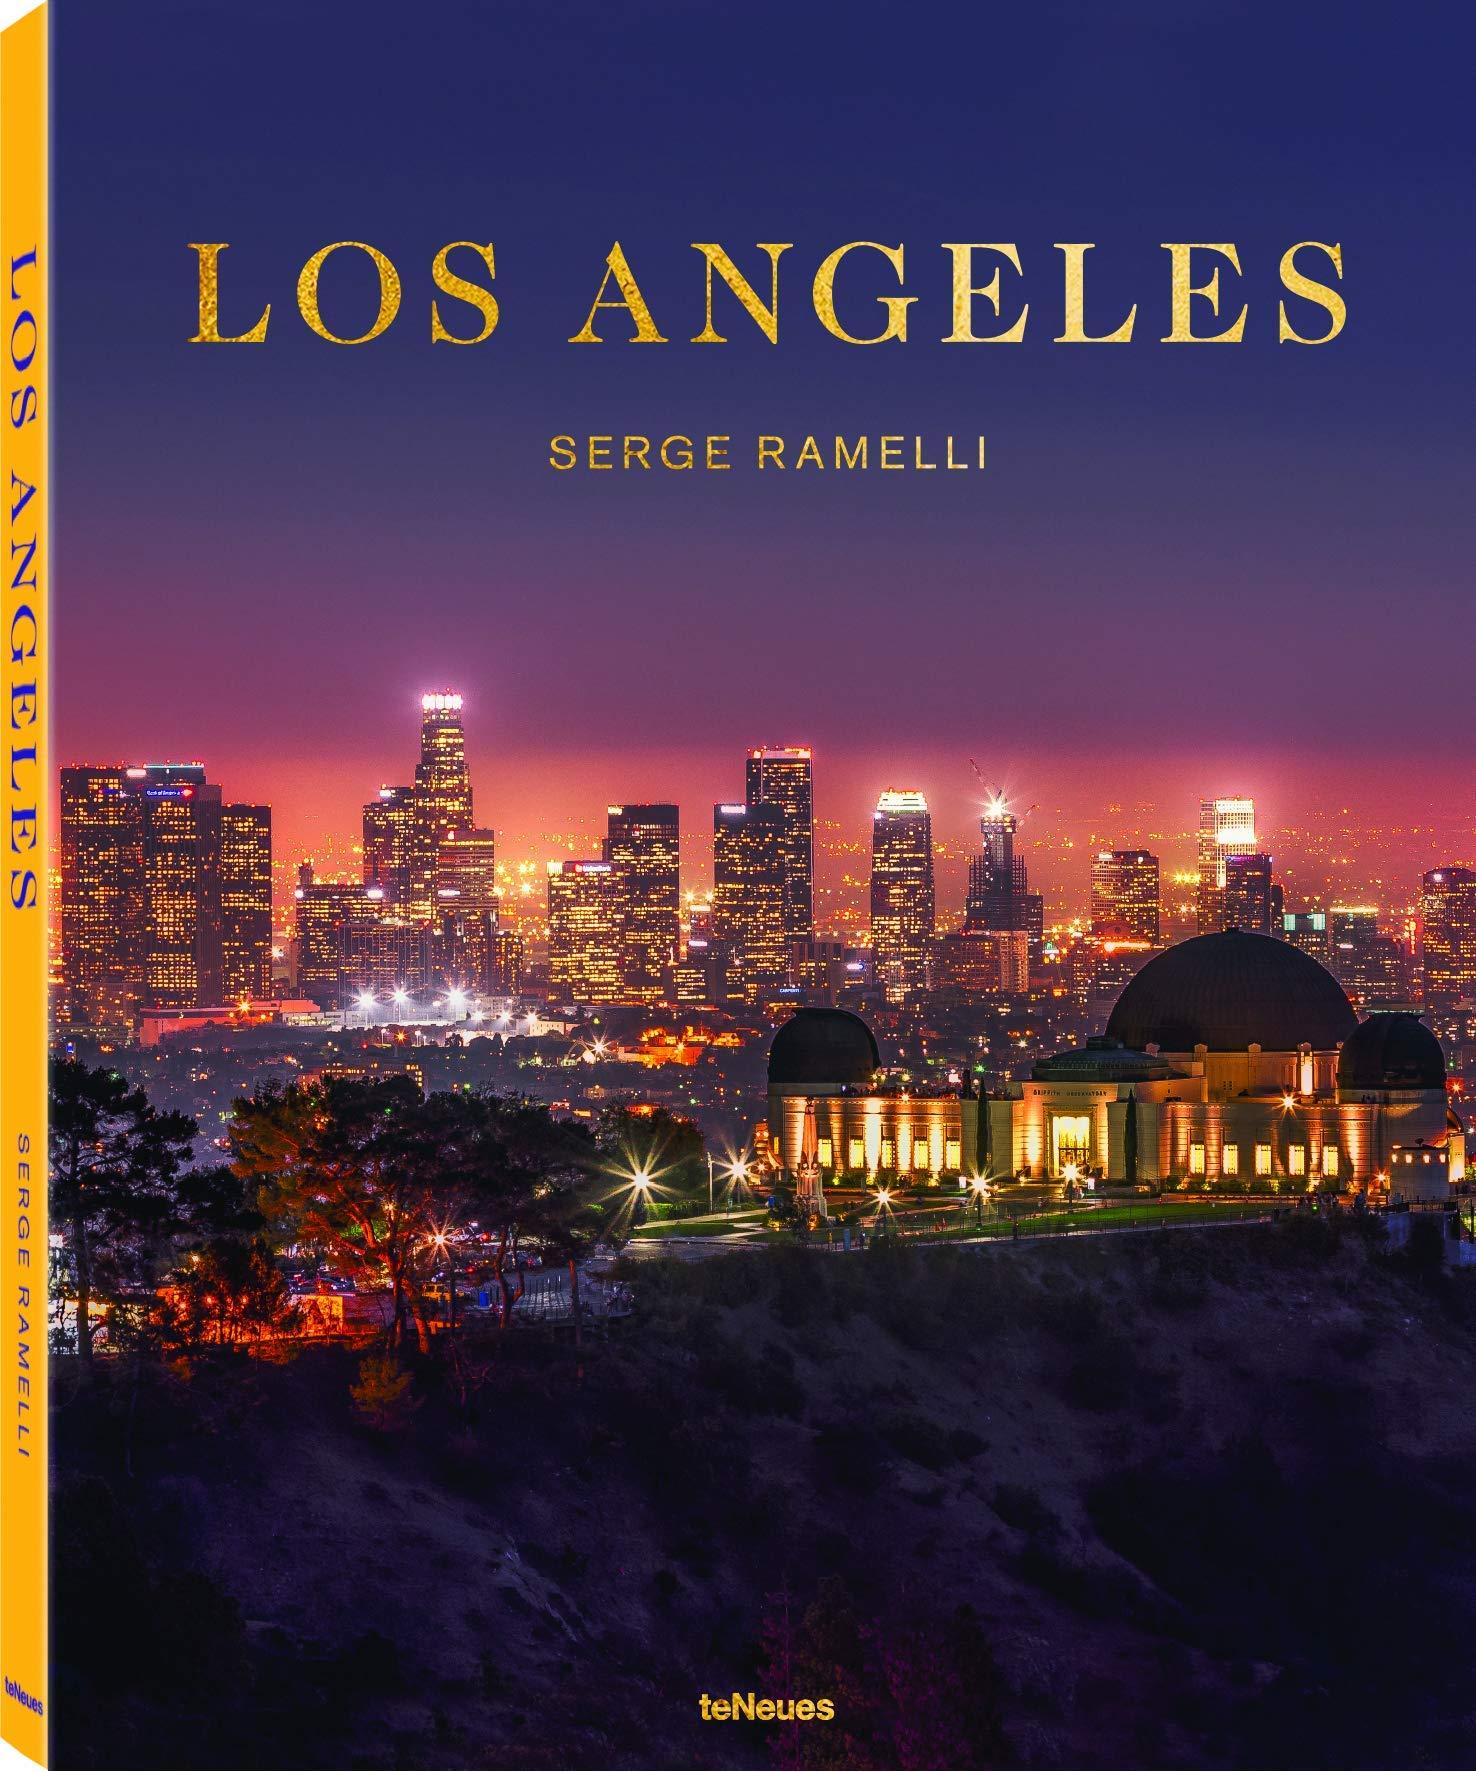 Los Ángeles (L.A.) - Página 2 81P01GigelL